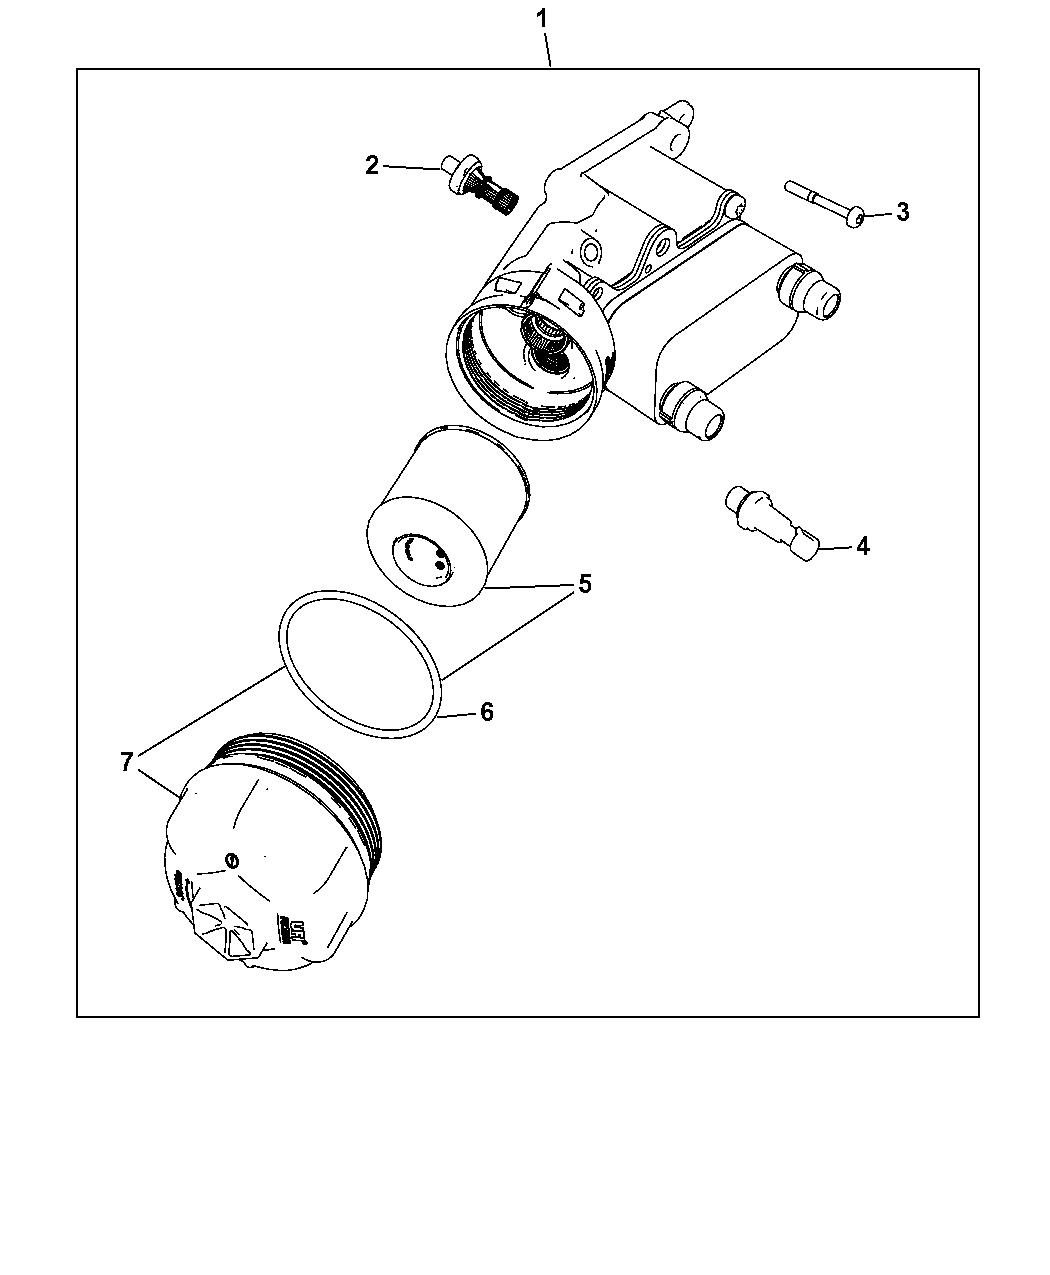 2013 Dodge Journey Fuel Filter - Wiring Diagram 89